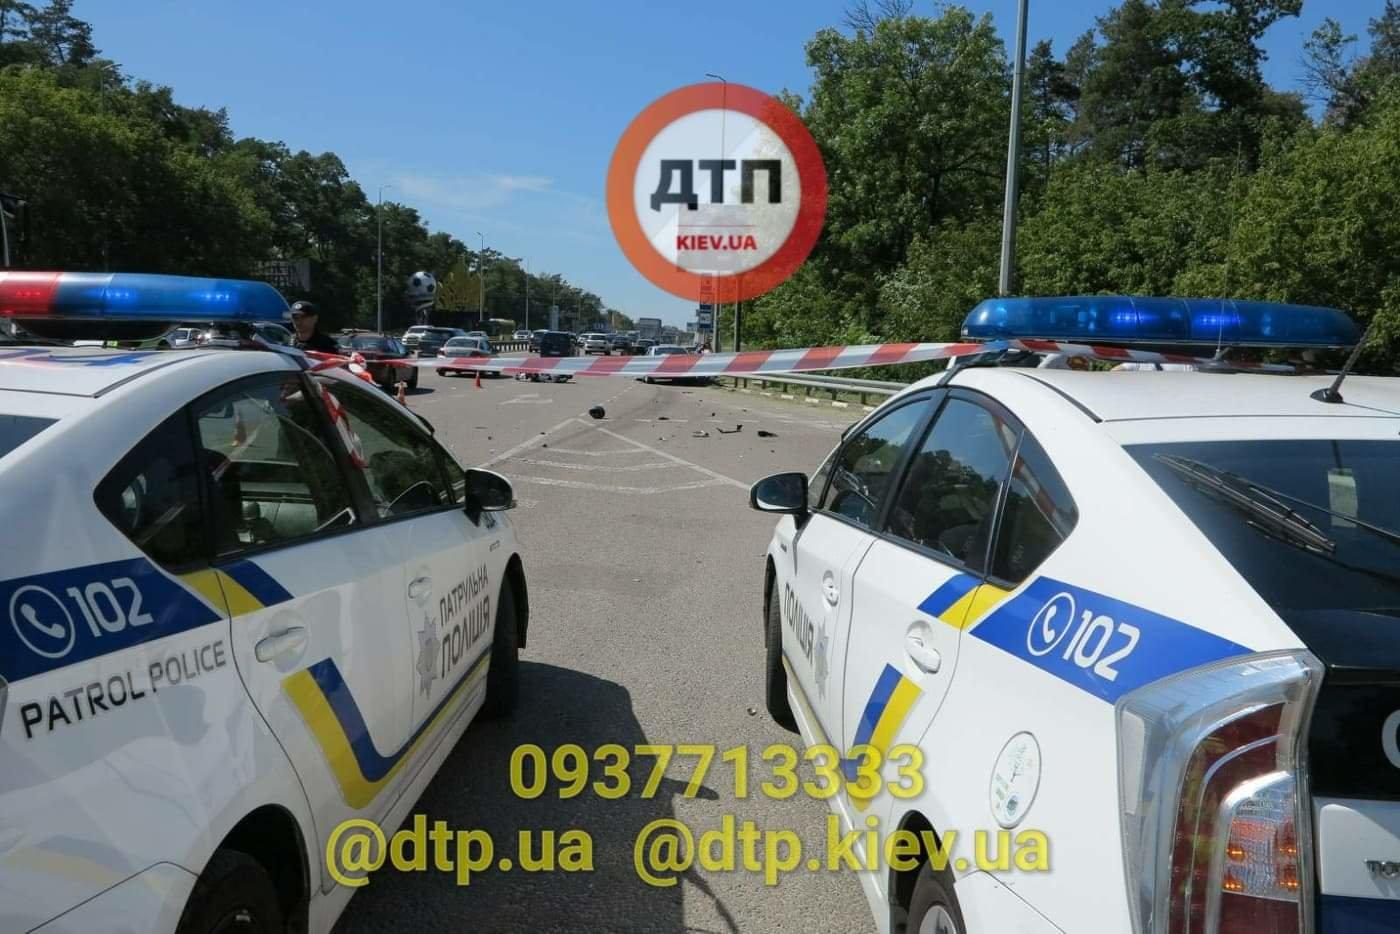 В Киеве произошло серьезное ДТП: легковушка сбила мотоциклиста - ФОТО, фото-2